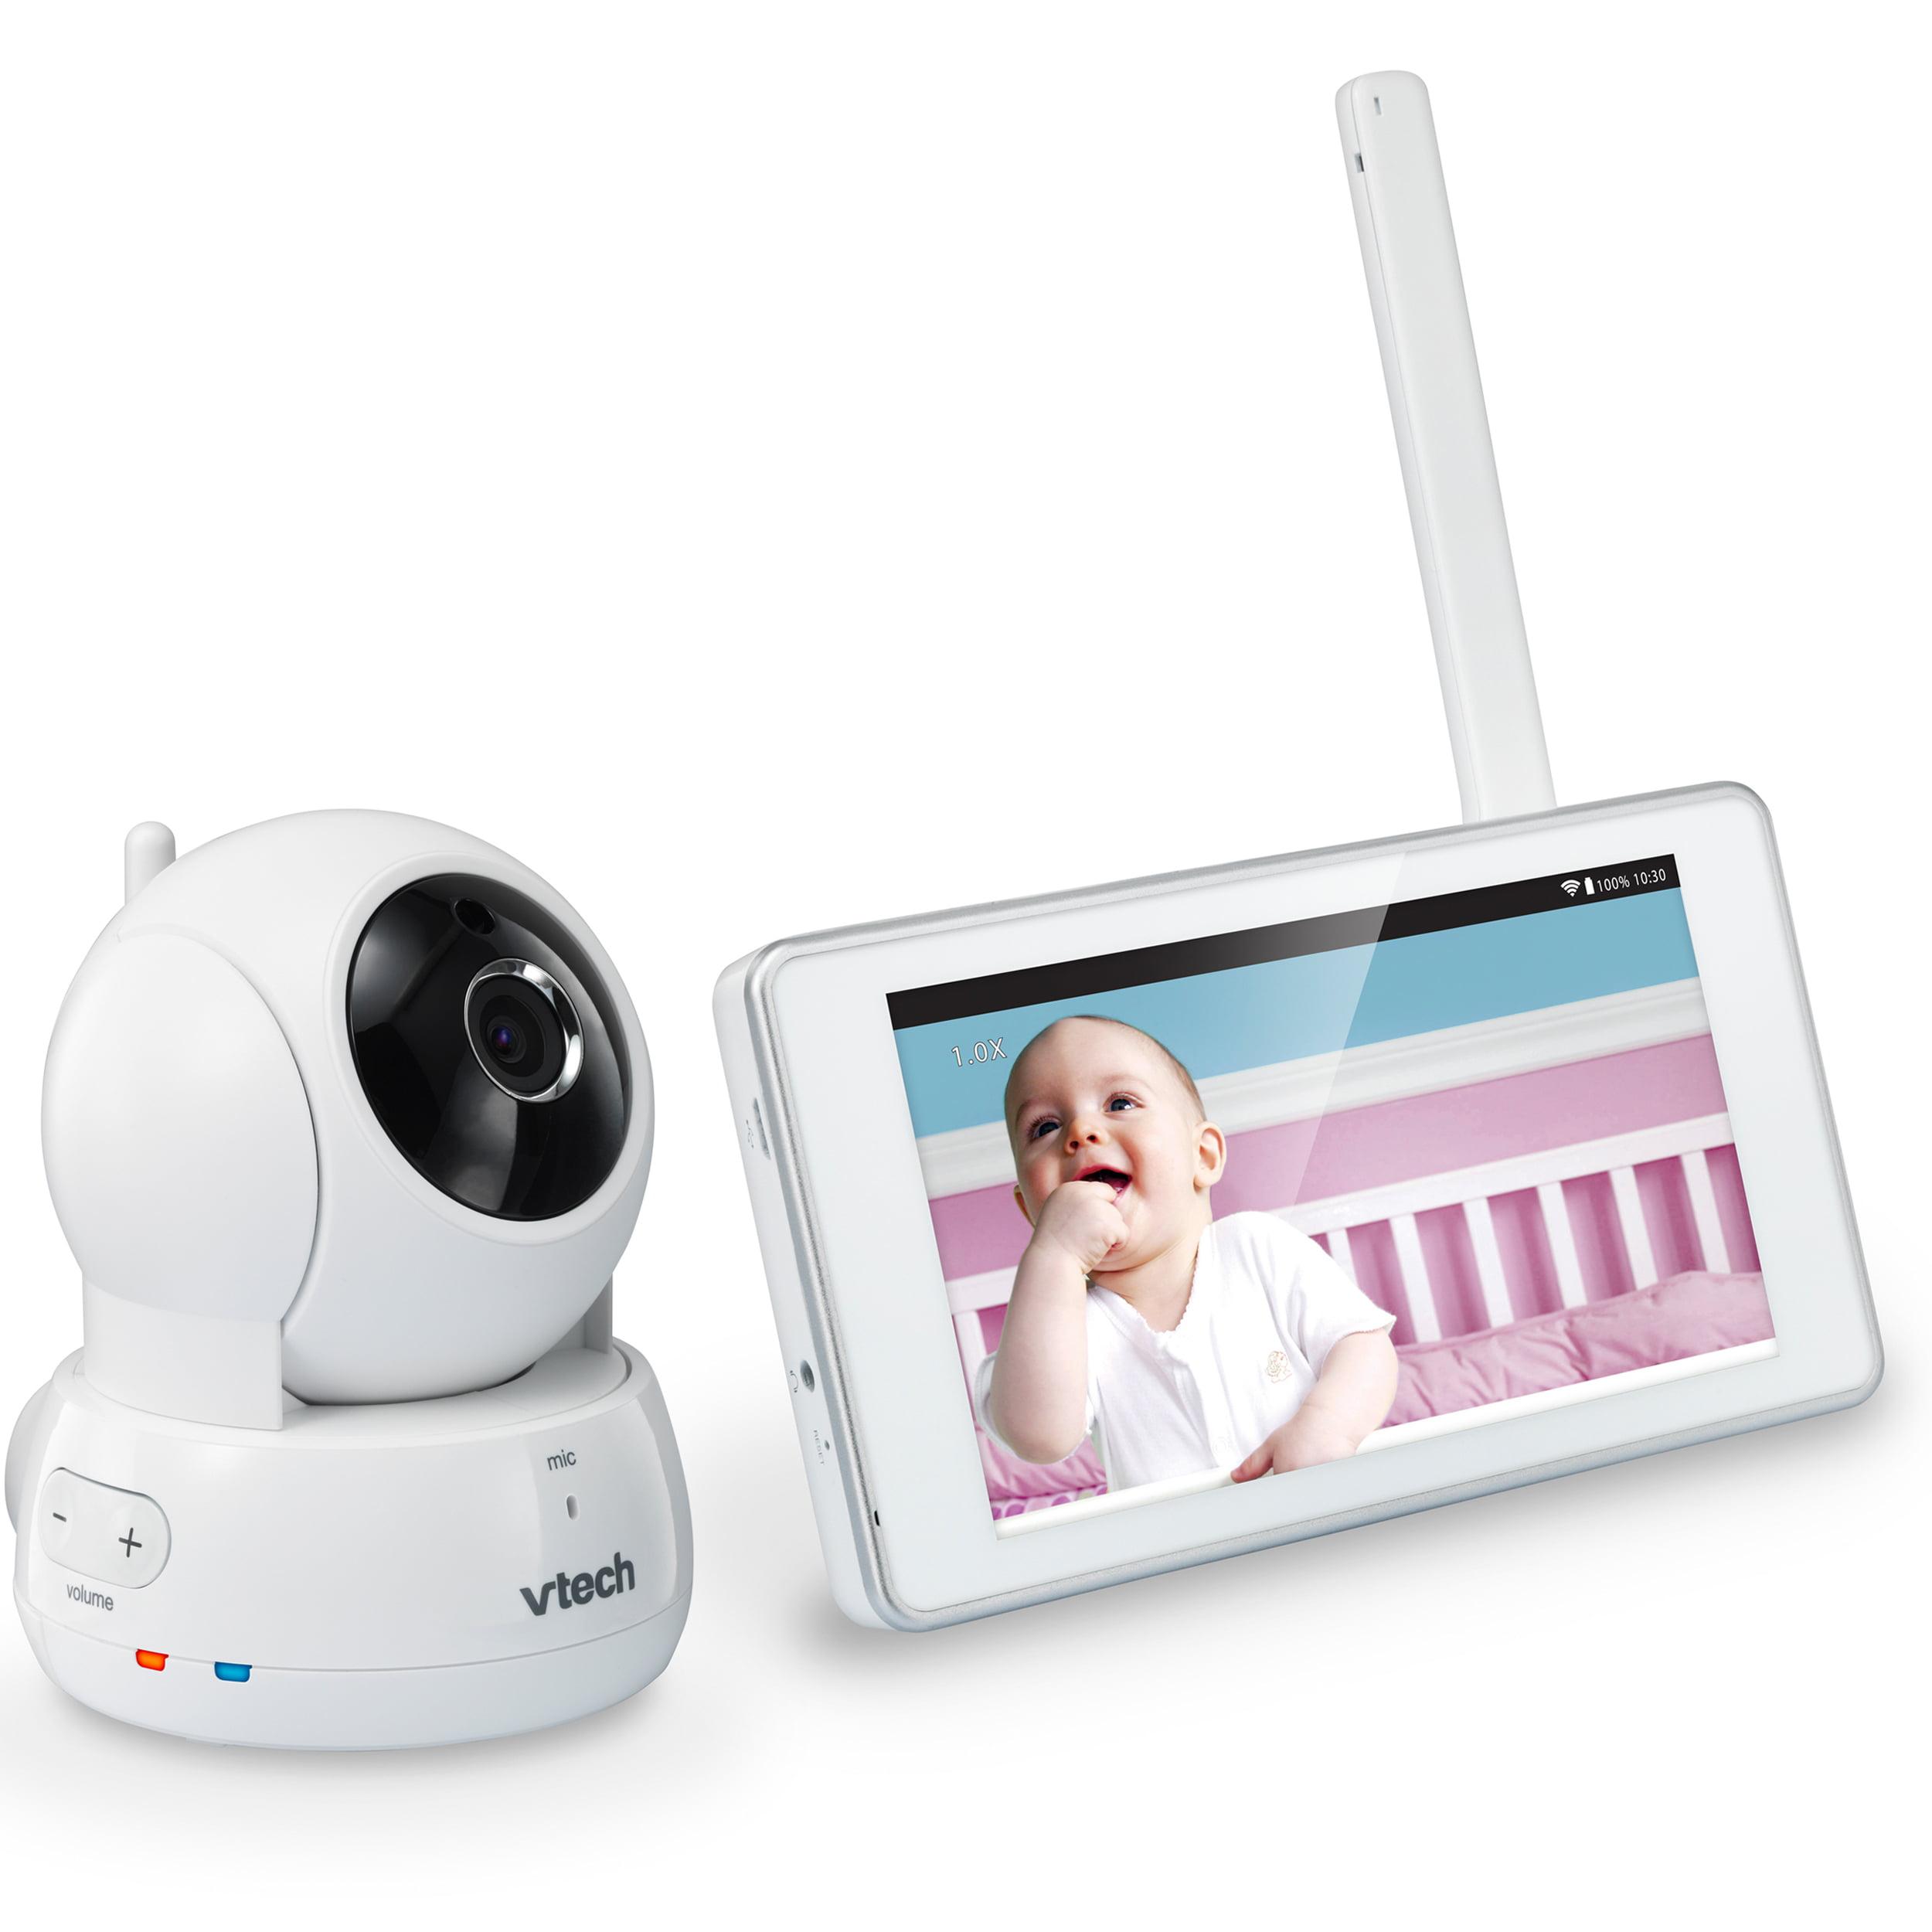 VTech VM991, Wi-Fi Video Baby Monitor, Remote Access, Pan & Tilt Camera